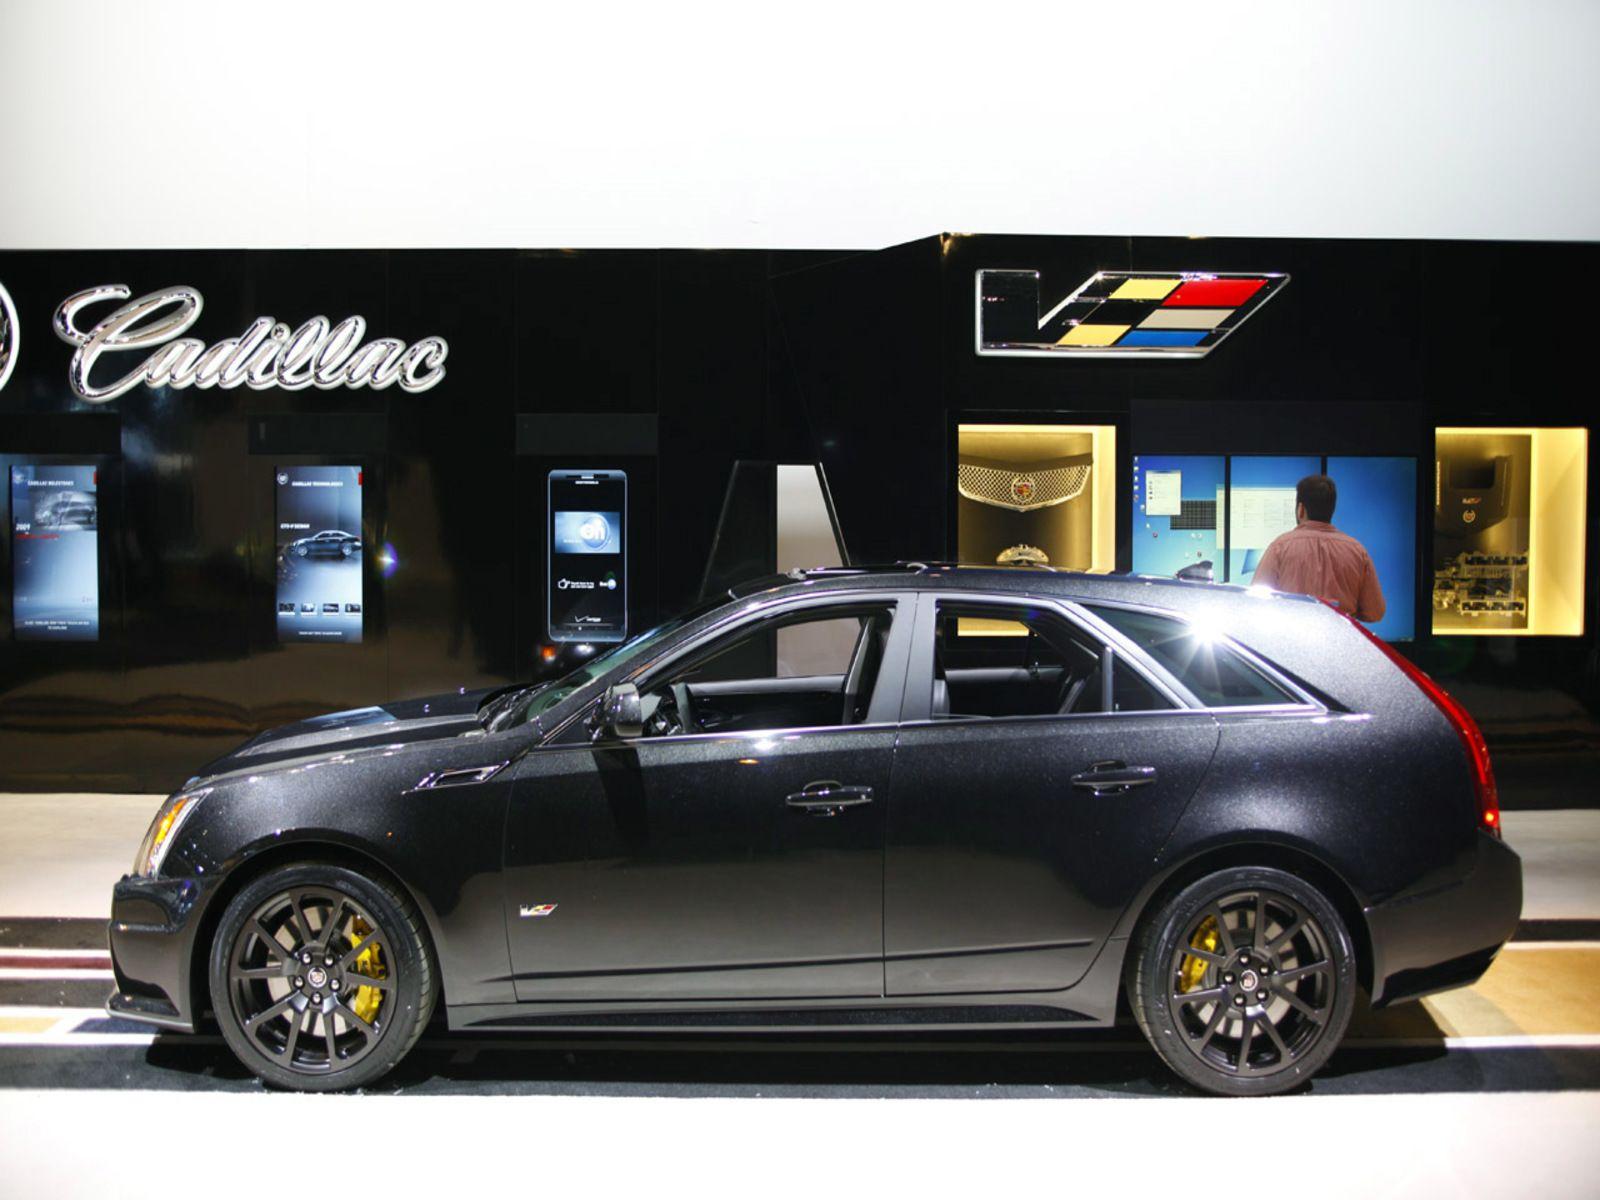 Cadillac Cts-V Wagon For Sale >> Used Cadillac Cts V Wagon For Sale In Texas World Car